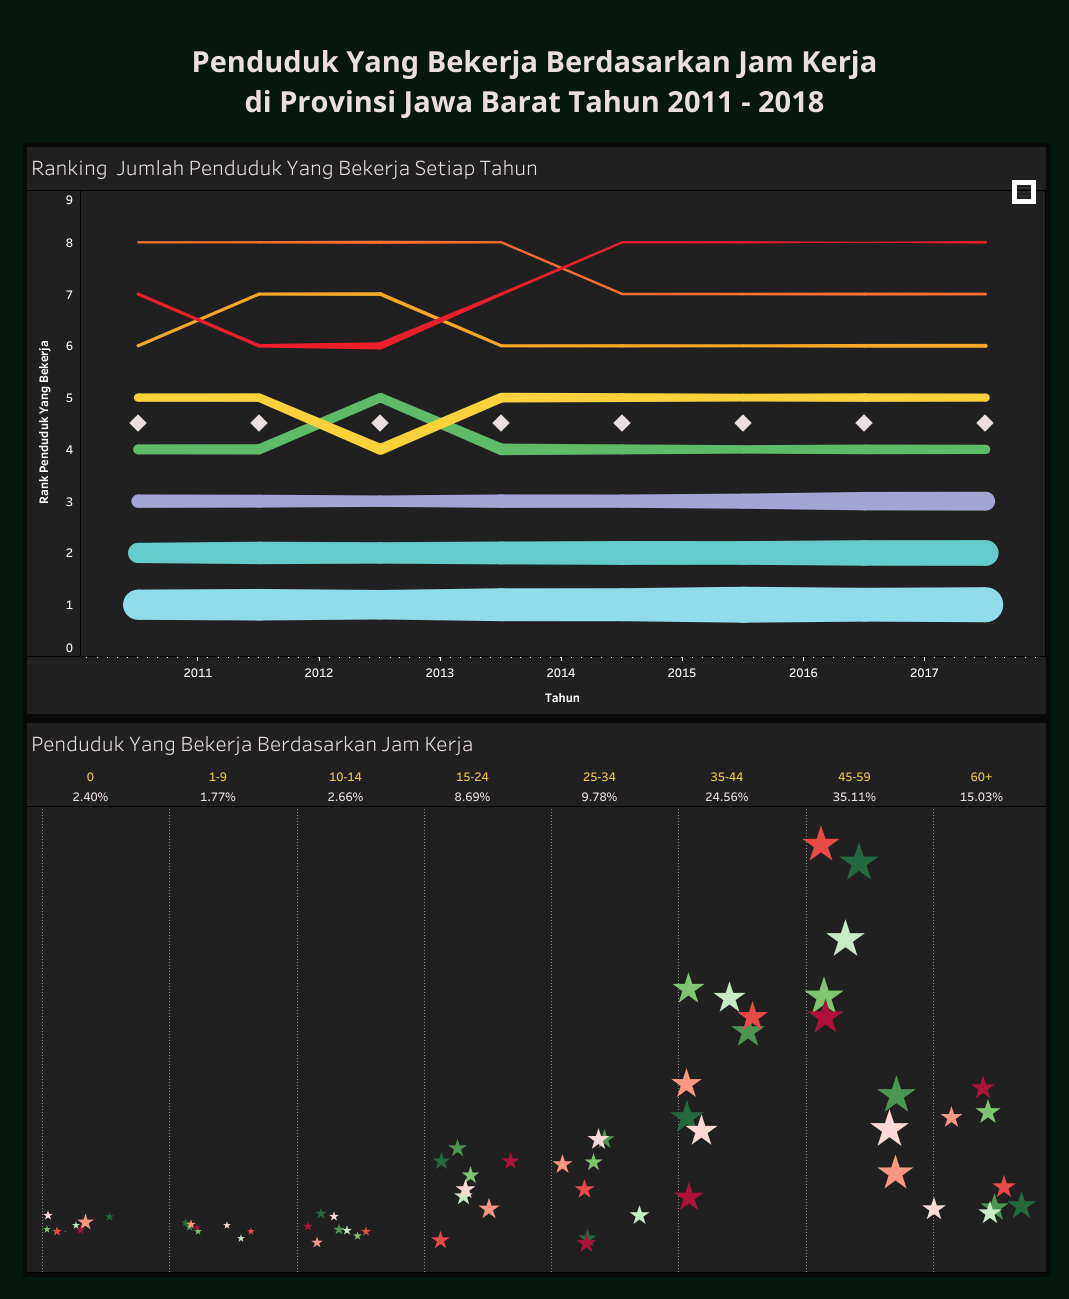 Penduduk Yang Bekerja Berdasarkan Jam Kerja Di Provinsi Jawa Barat Tahun 2011 - 2018